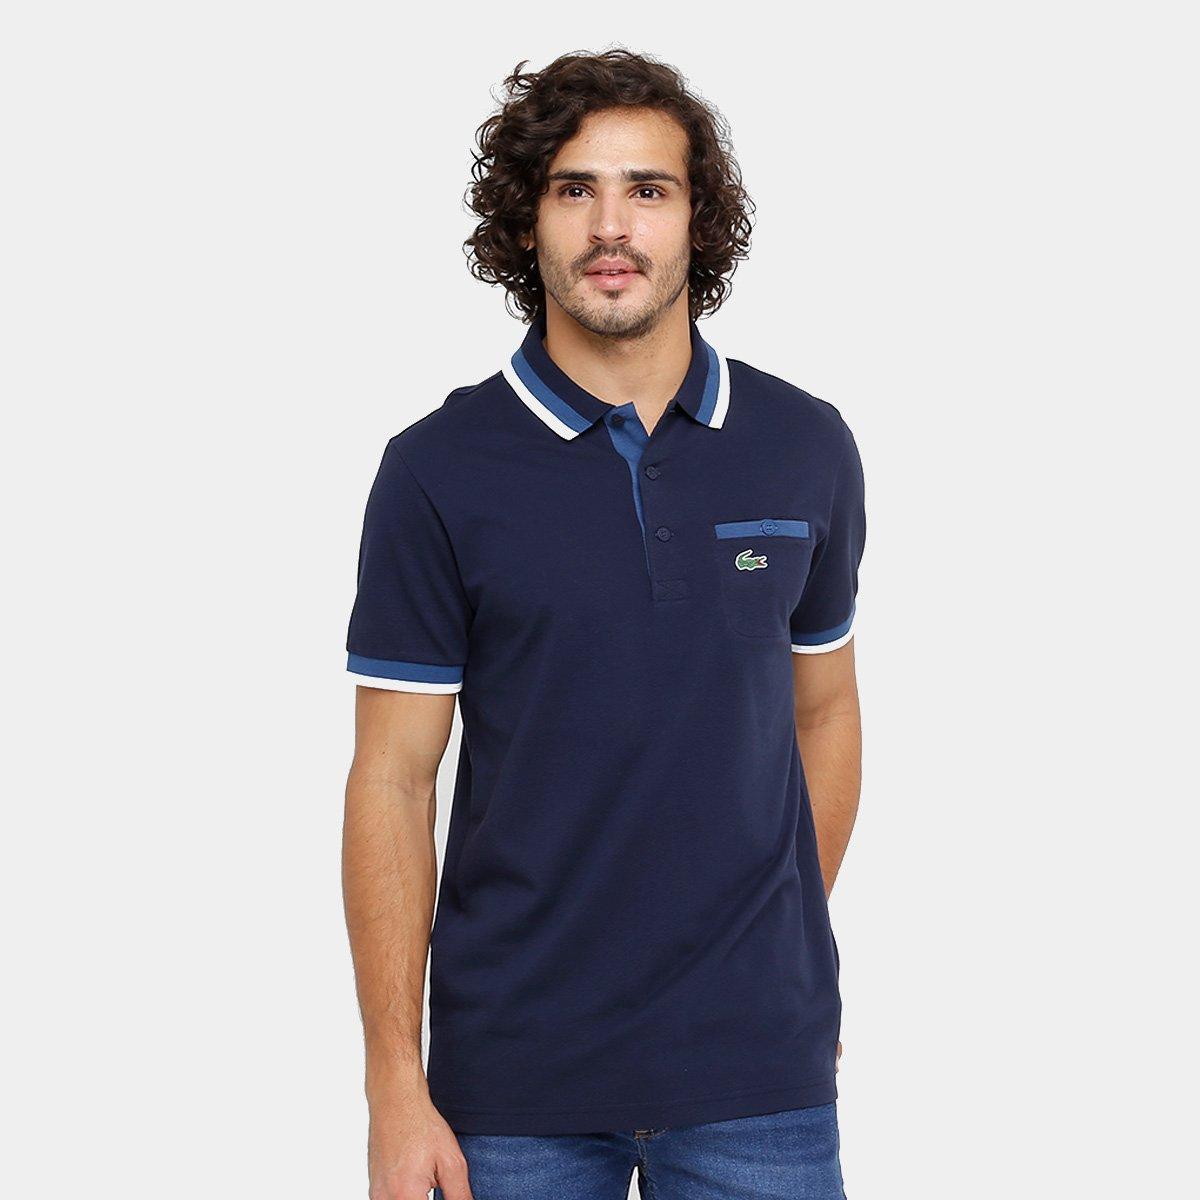 136acf4b7b6 Agora Compre Netshoes Bolso Botão Lacoste Camisa Polo Masculina RwFYYX